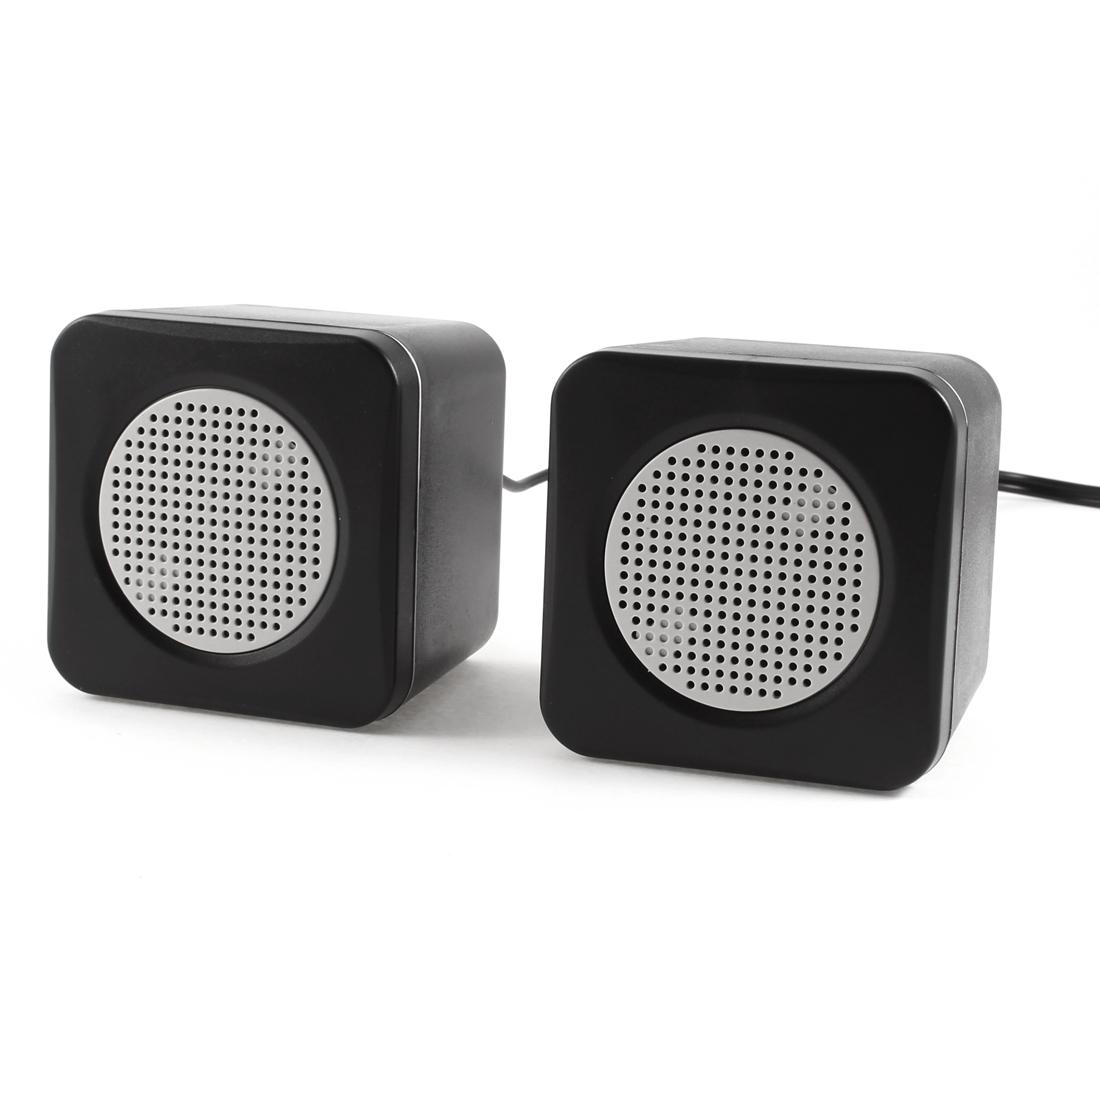 Pair PC Mp4 3.5mm Plug USB 2.0 Mini Multimedia Speaker Loudspeaker Black White